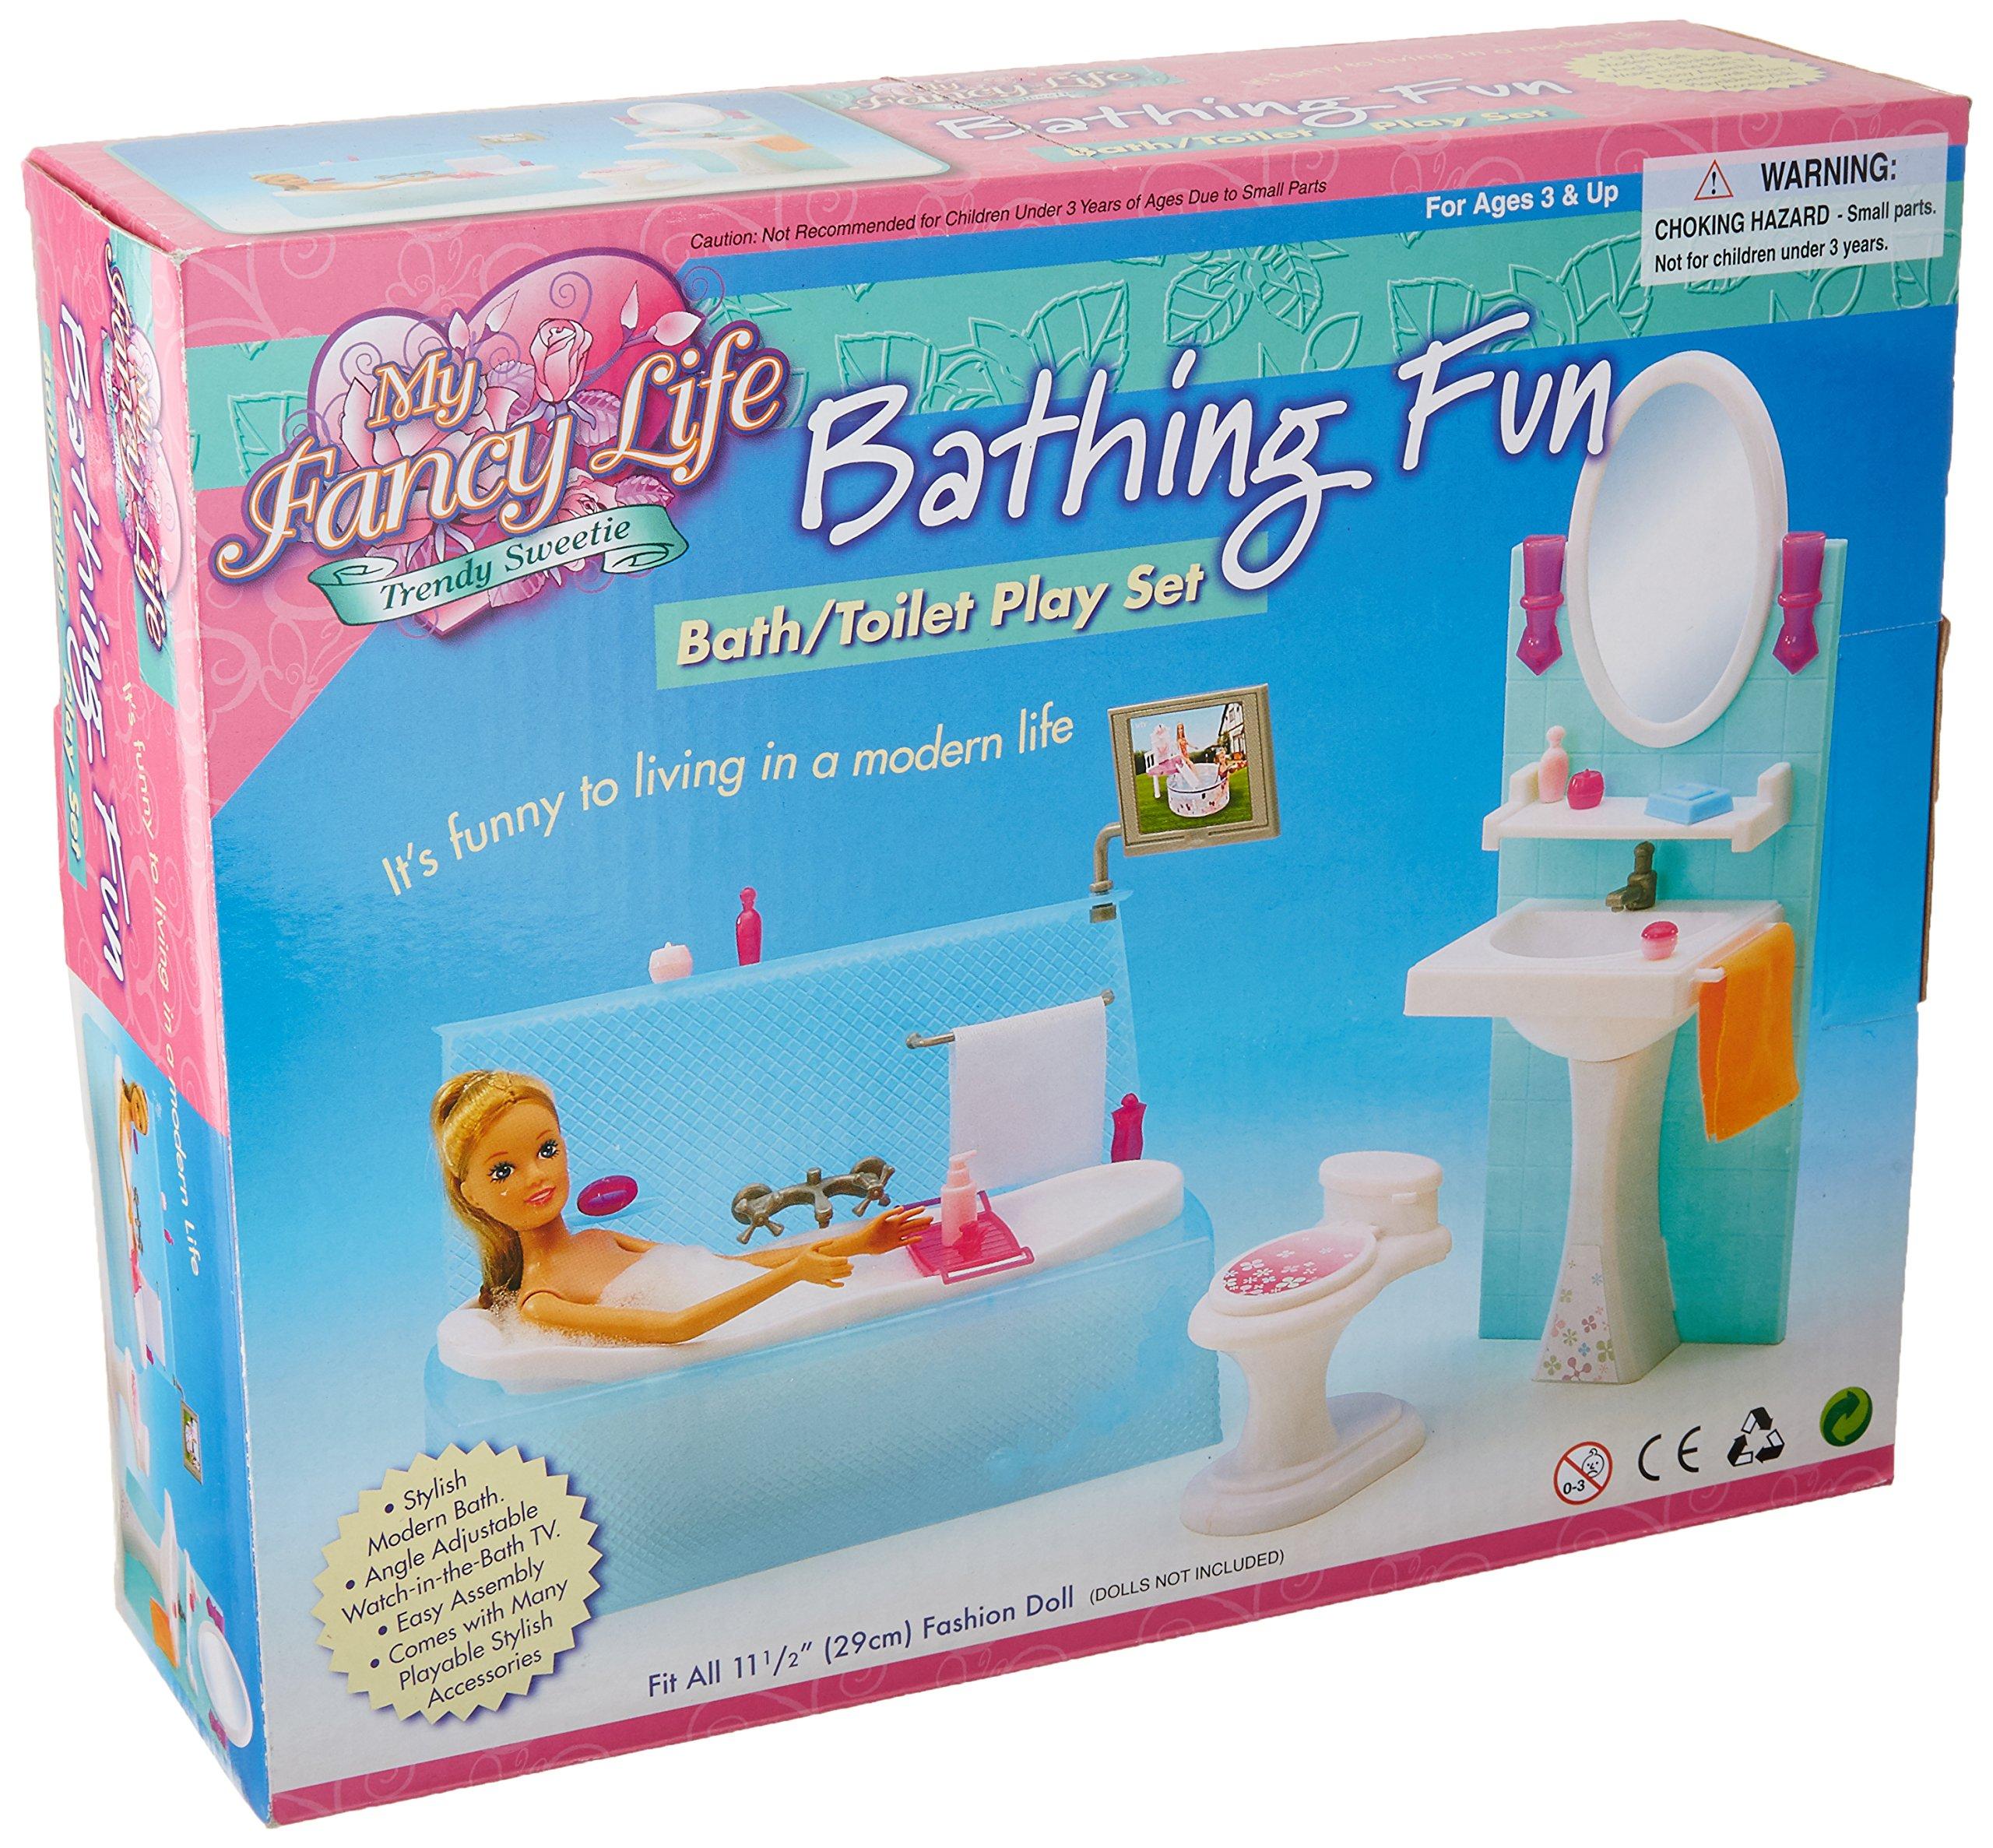 My Fancy Life Dollhouse Furniture - Bathing Fun with Bath Tub and Toilet Playset by My Fancy Life